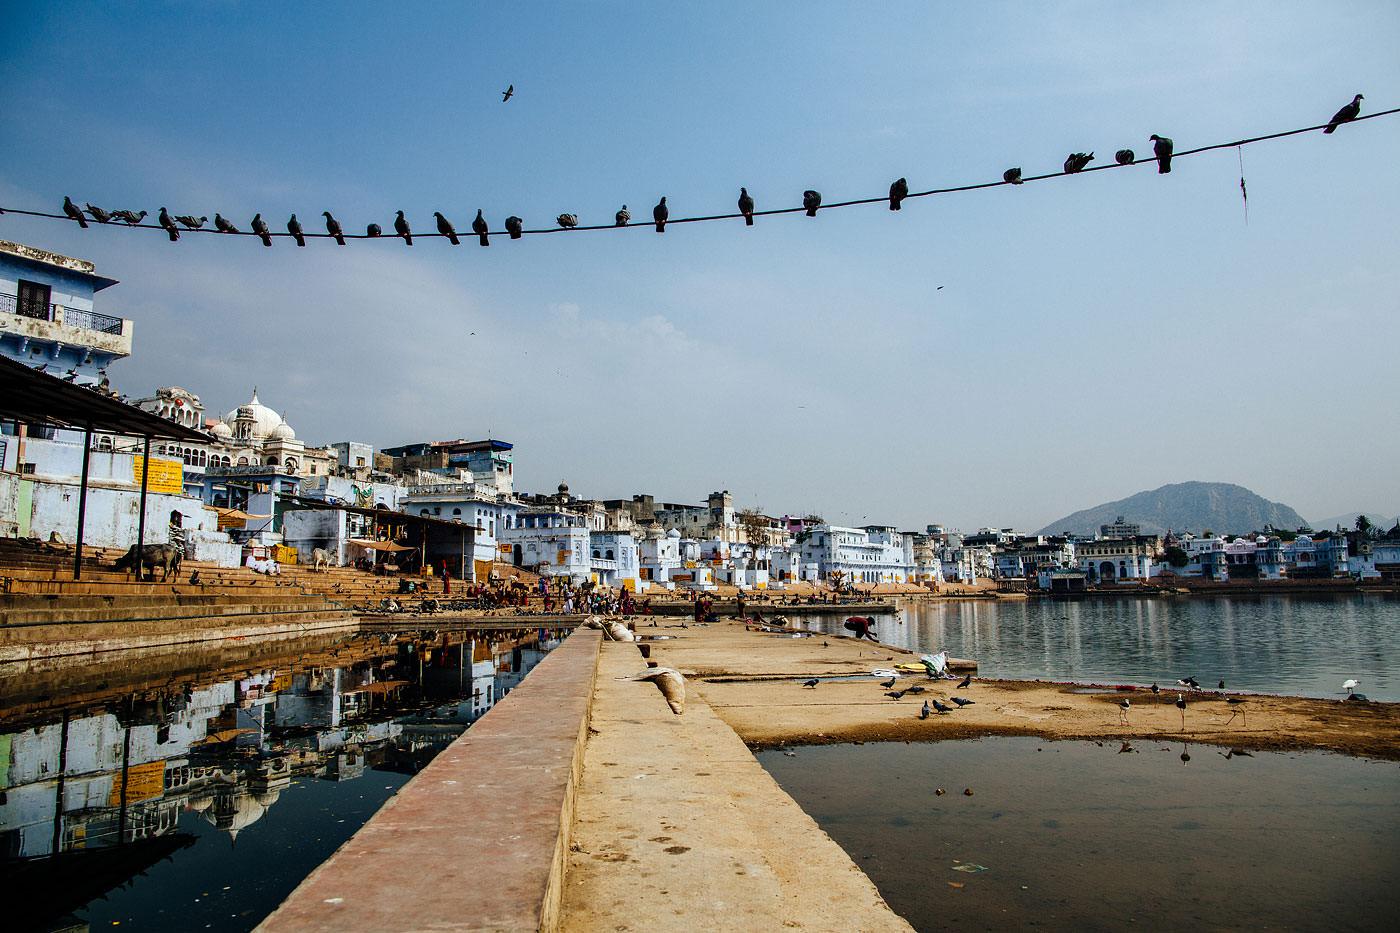 Pushkar, India // 2014